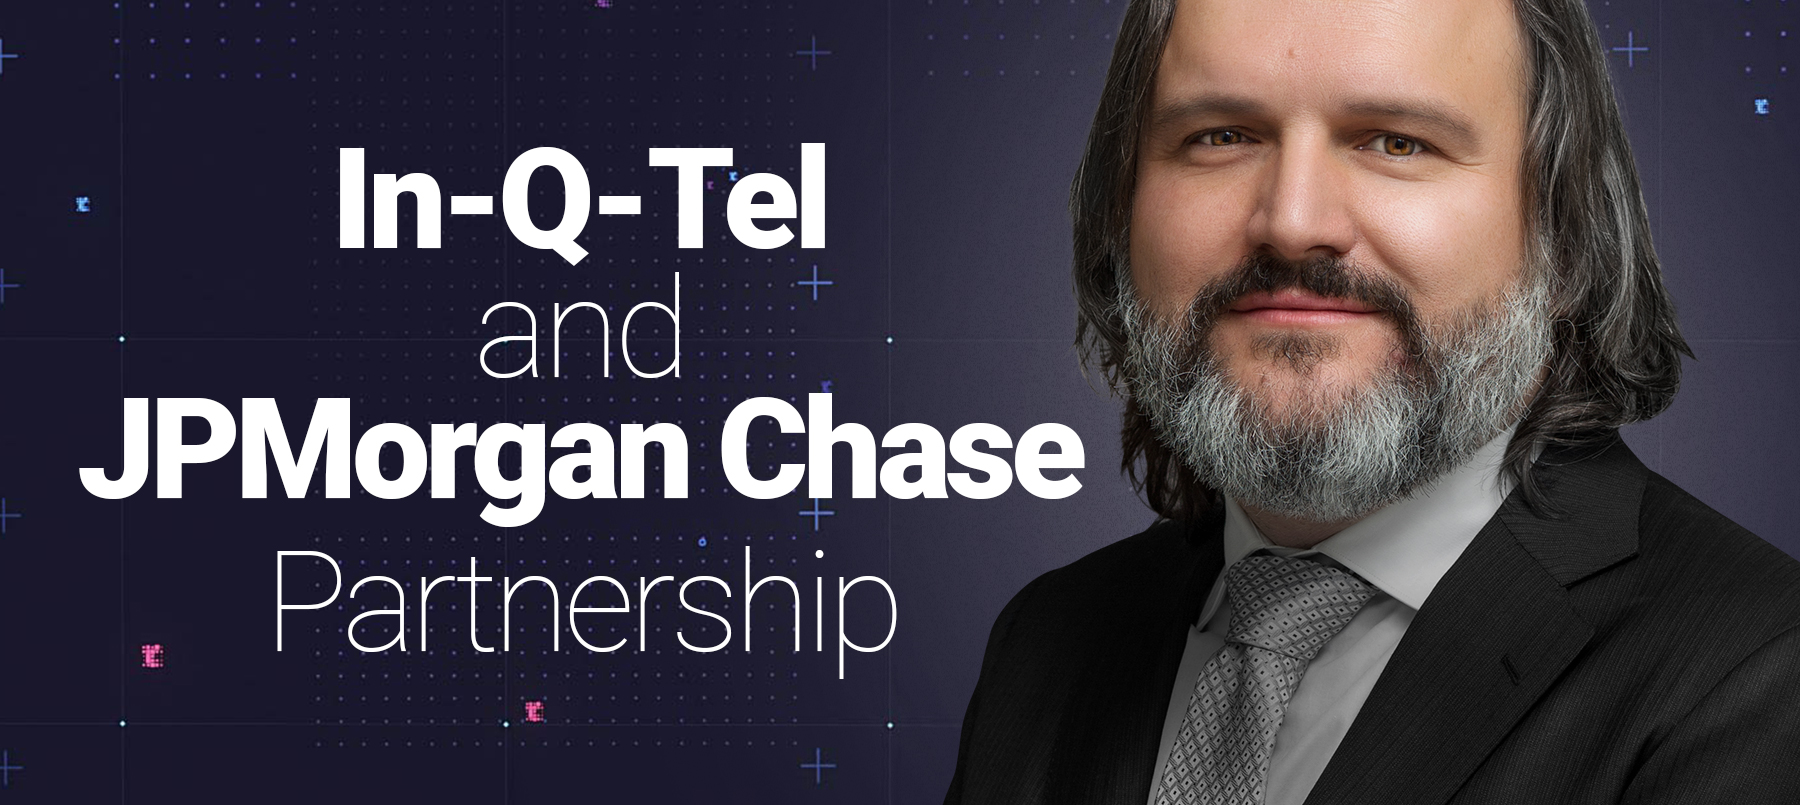 Why In-Q-Tel and JPMorgan Chase Chose ReversingLabs | ReversingLabs